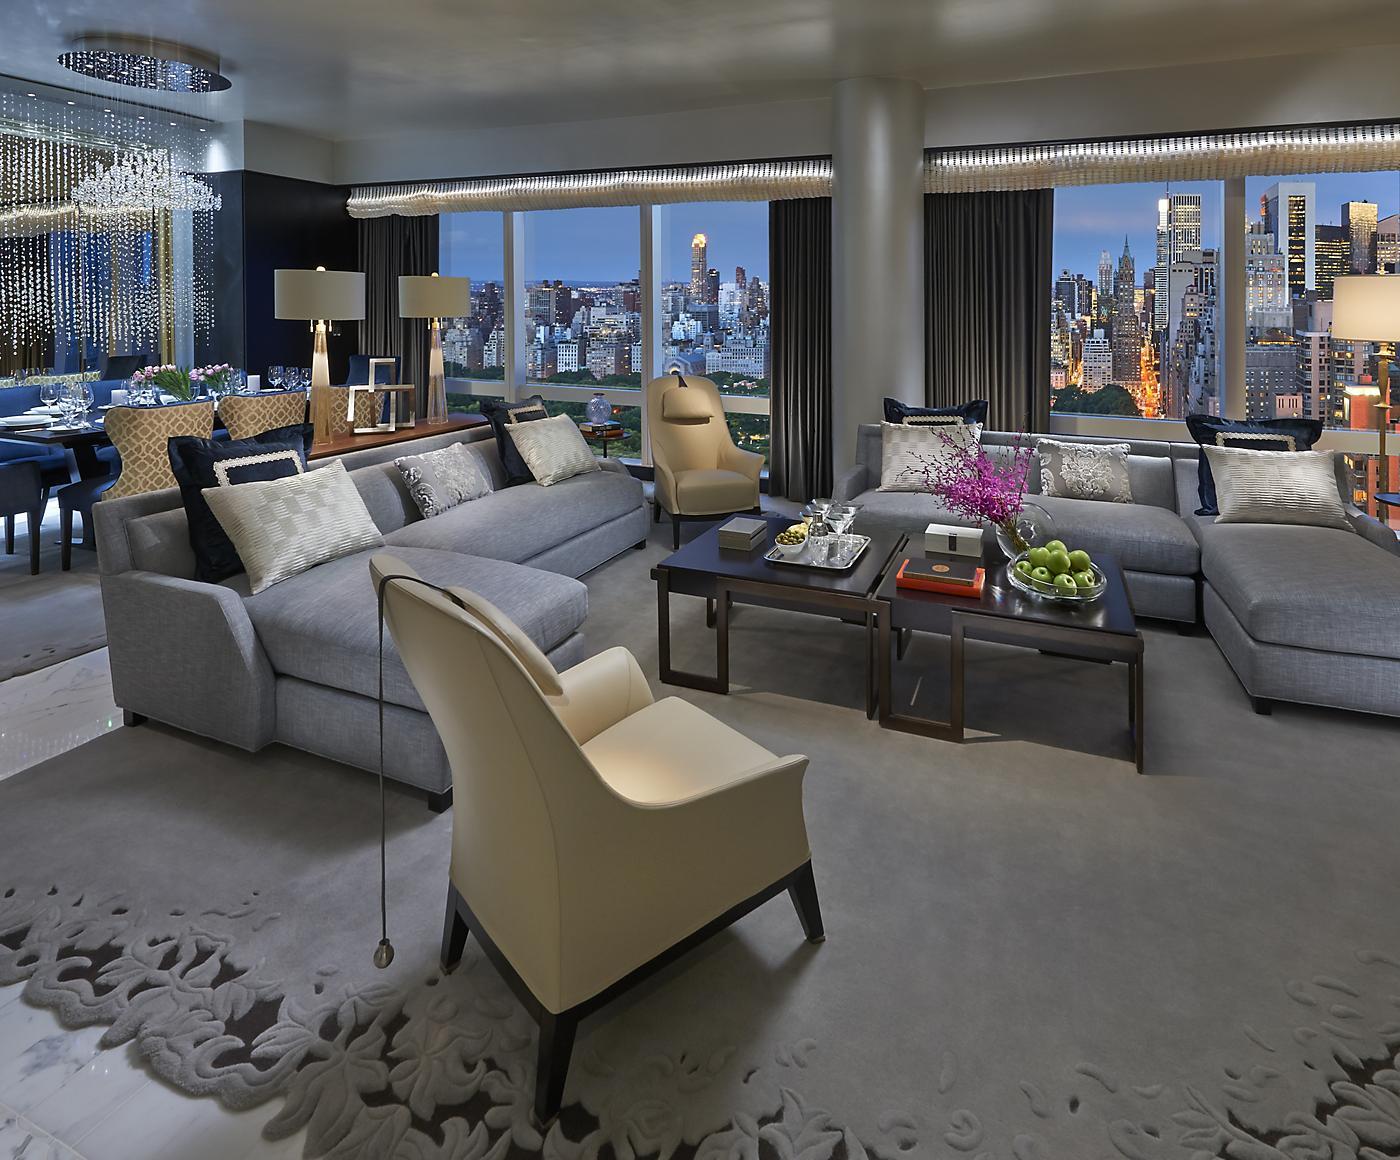 Mandarin hotel new york suite in living room